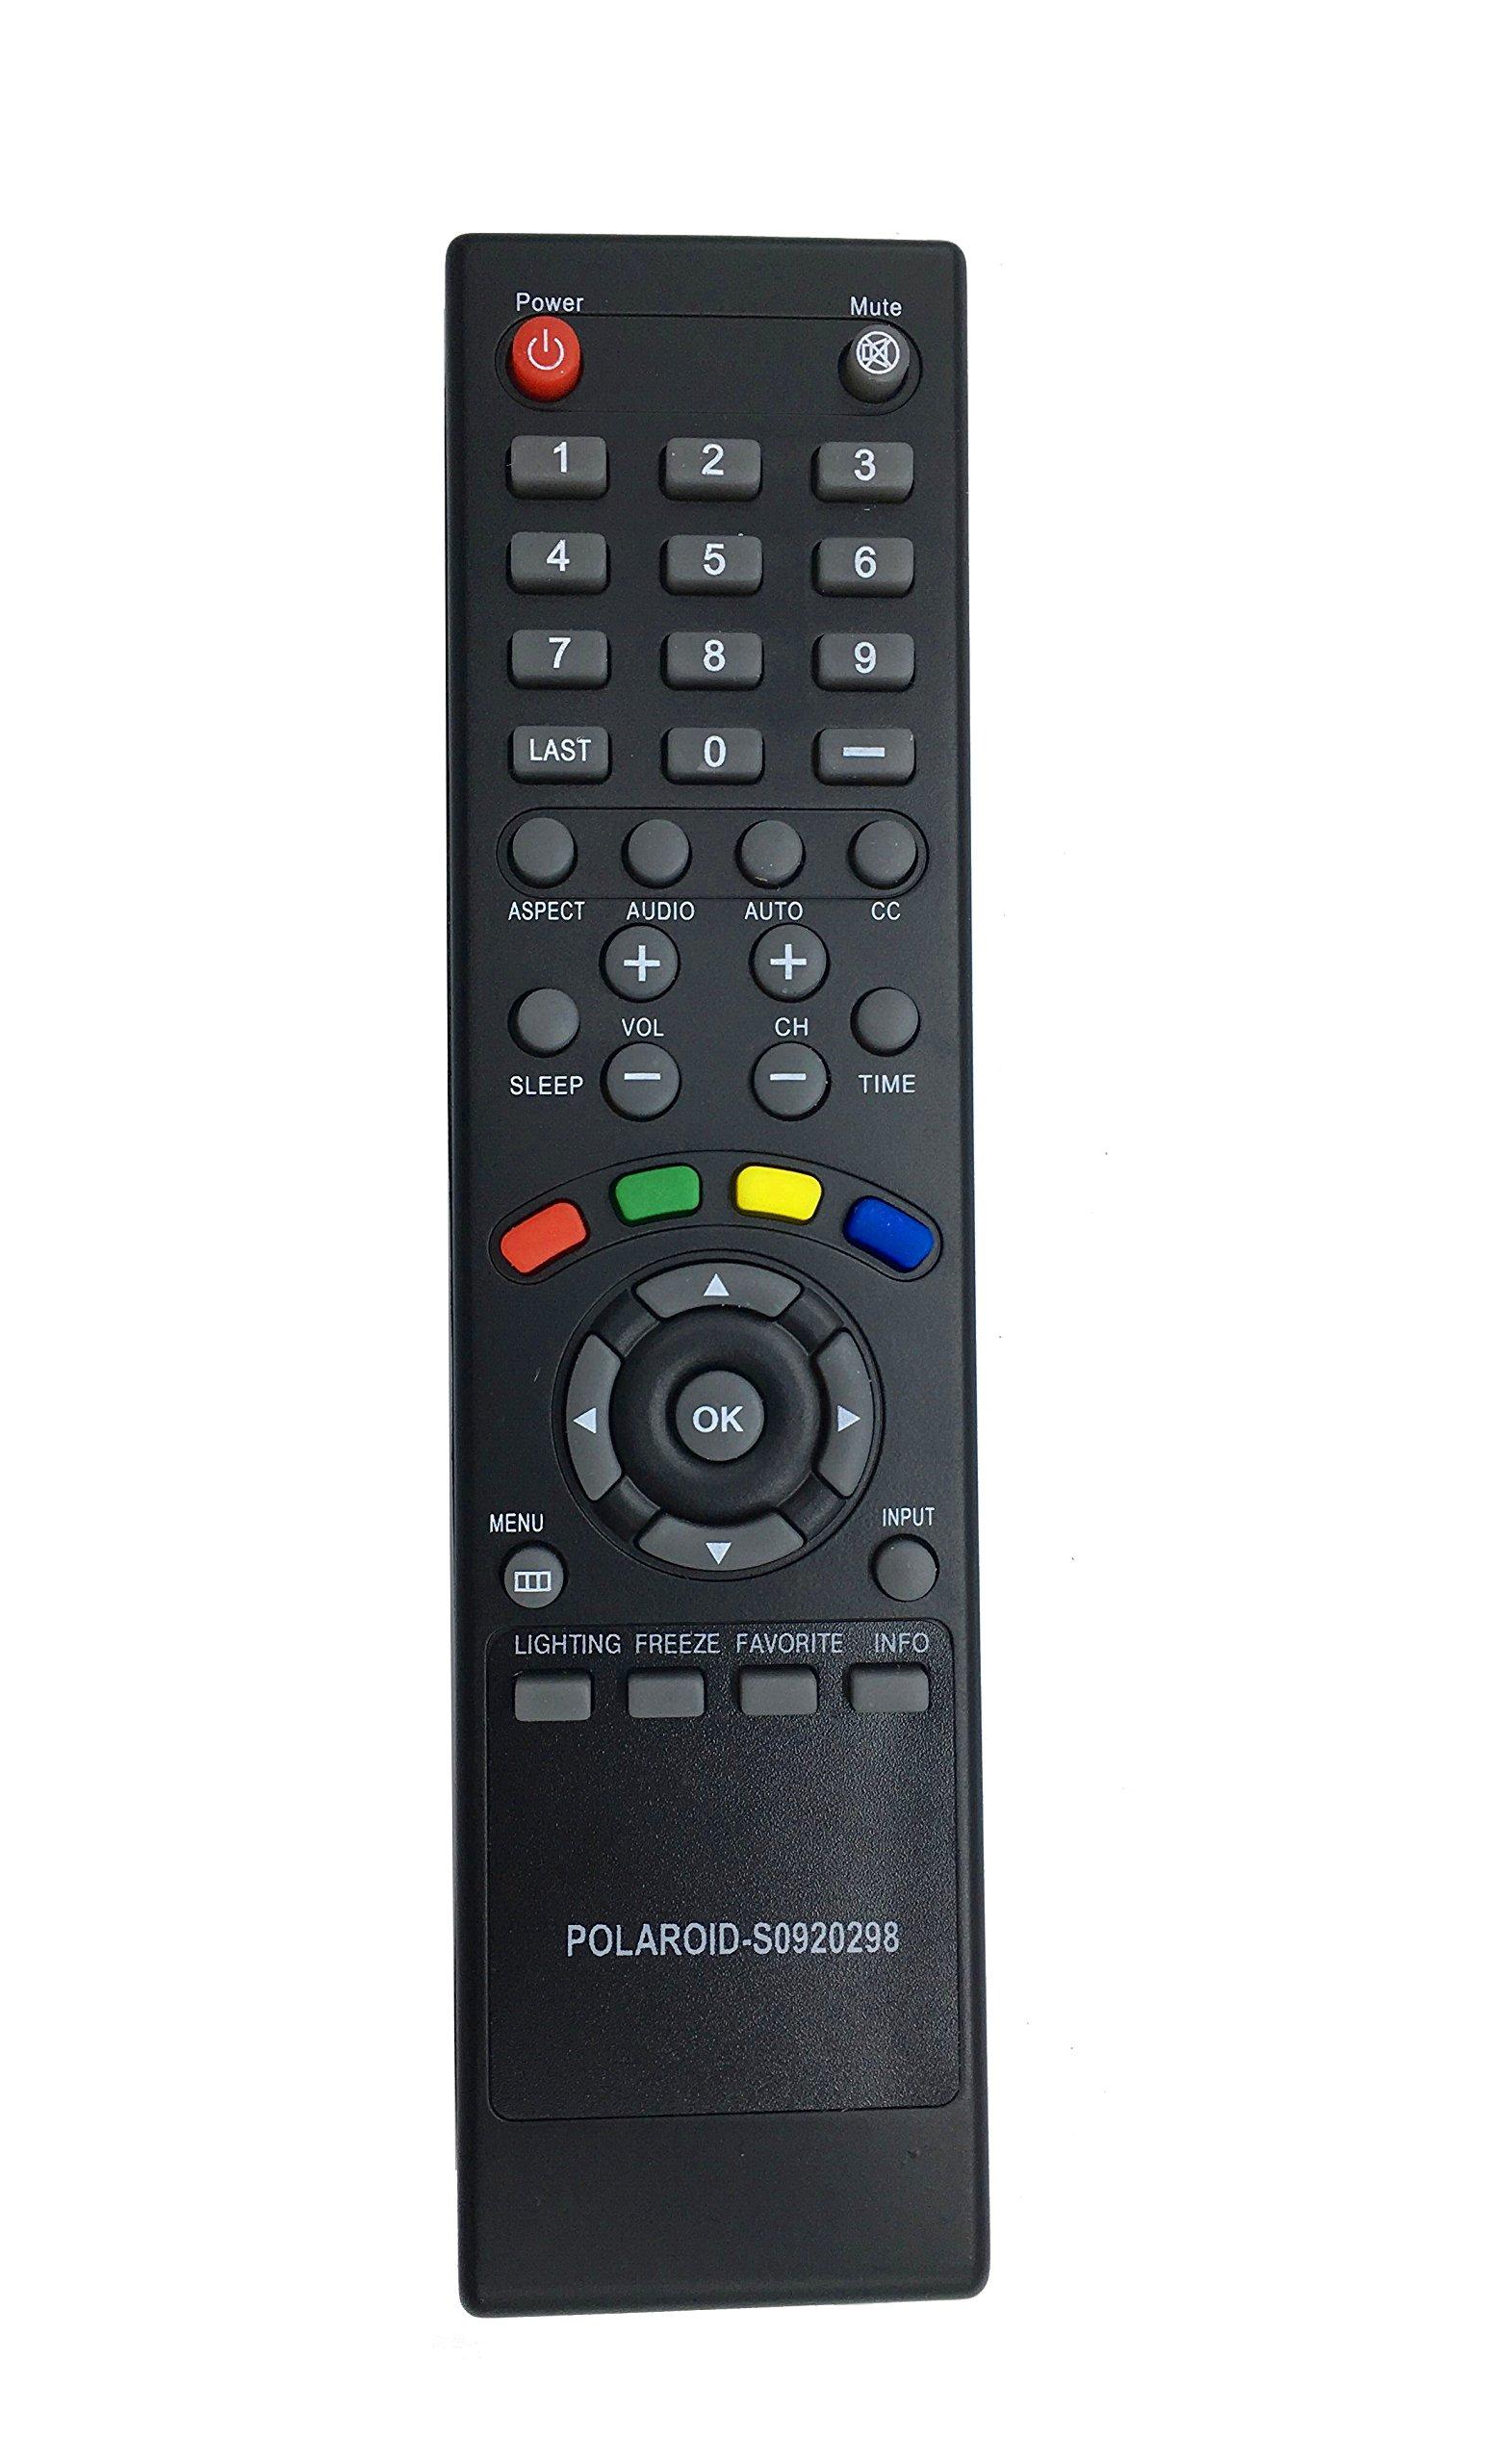 Control Remoto Vinabty S0920298 Polaroid S0920298 Lcd Tv ...